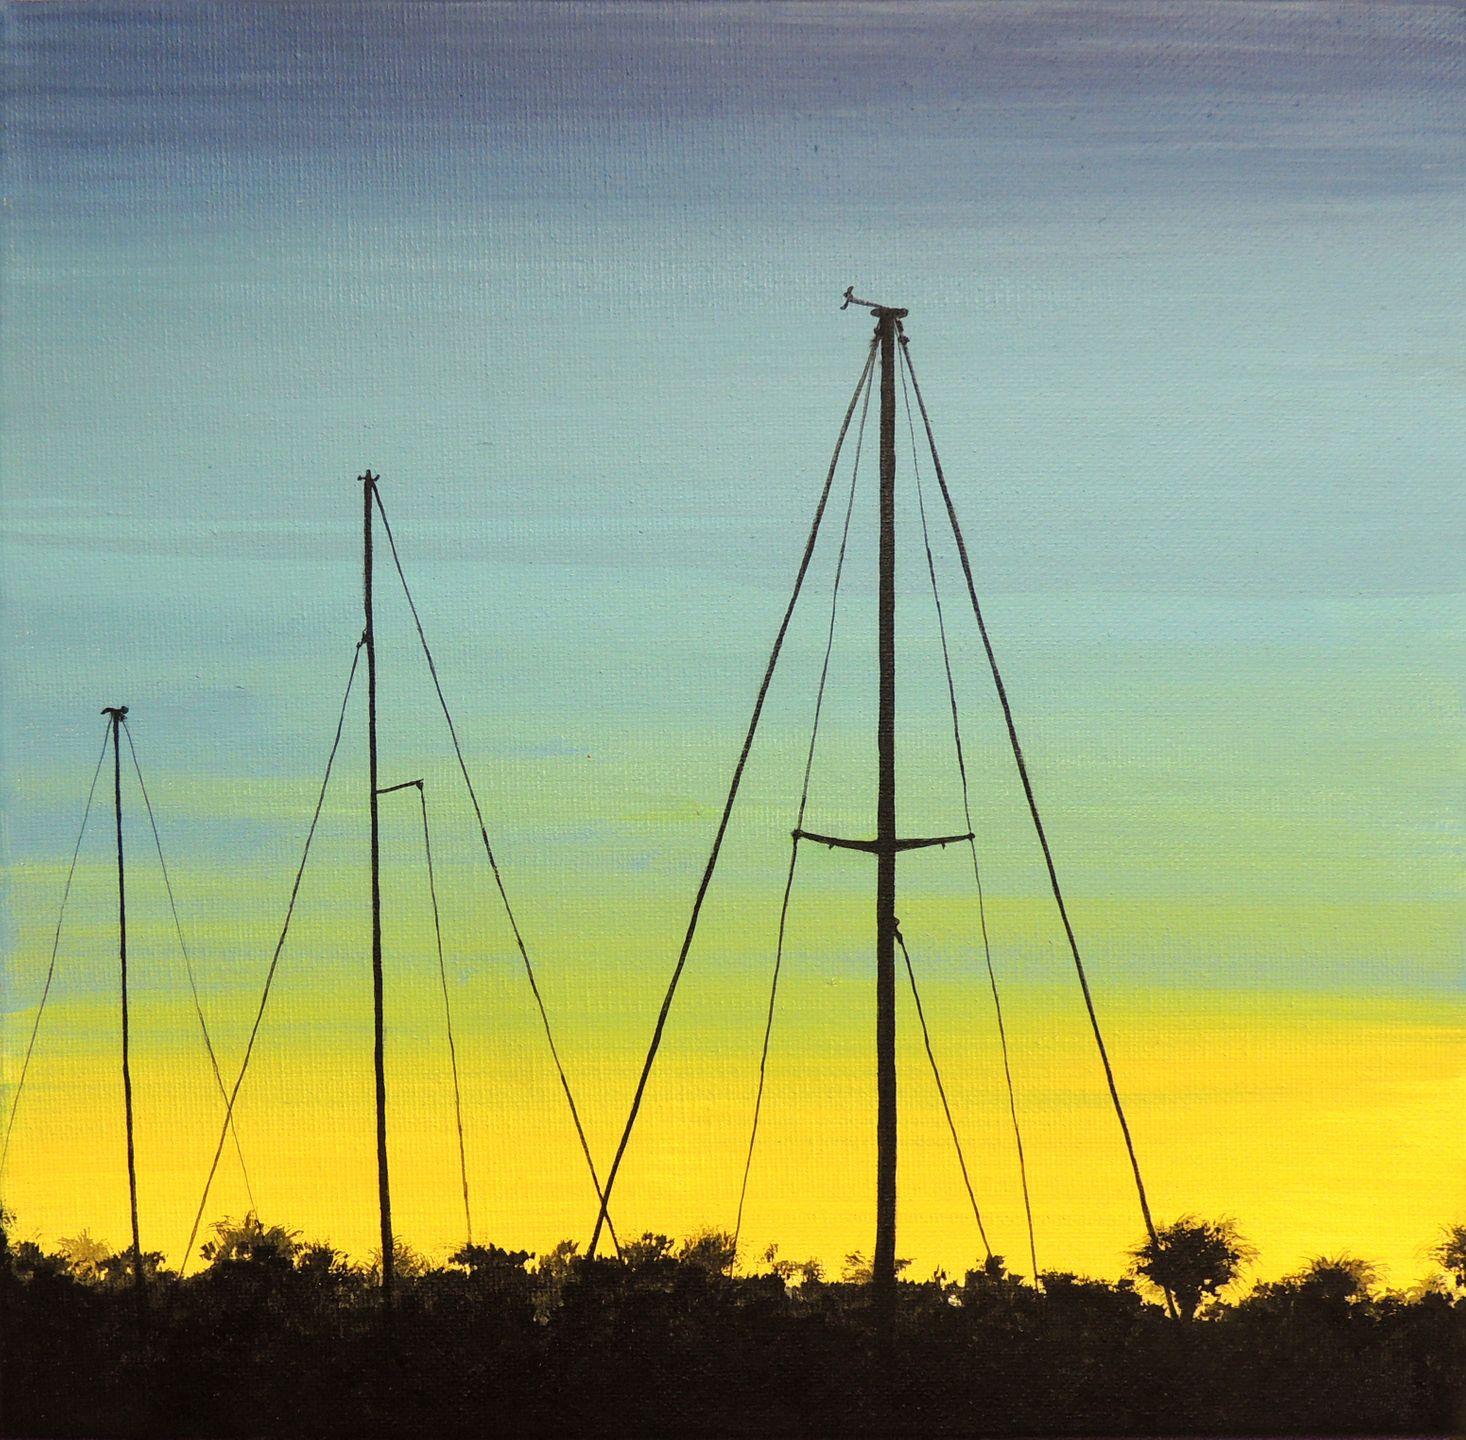 Spacious-Sky-w-Docked-Sail-Boats-DSCN5749.jpg